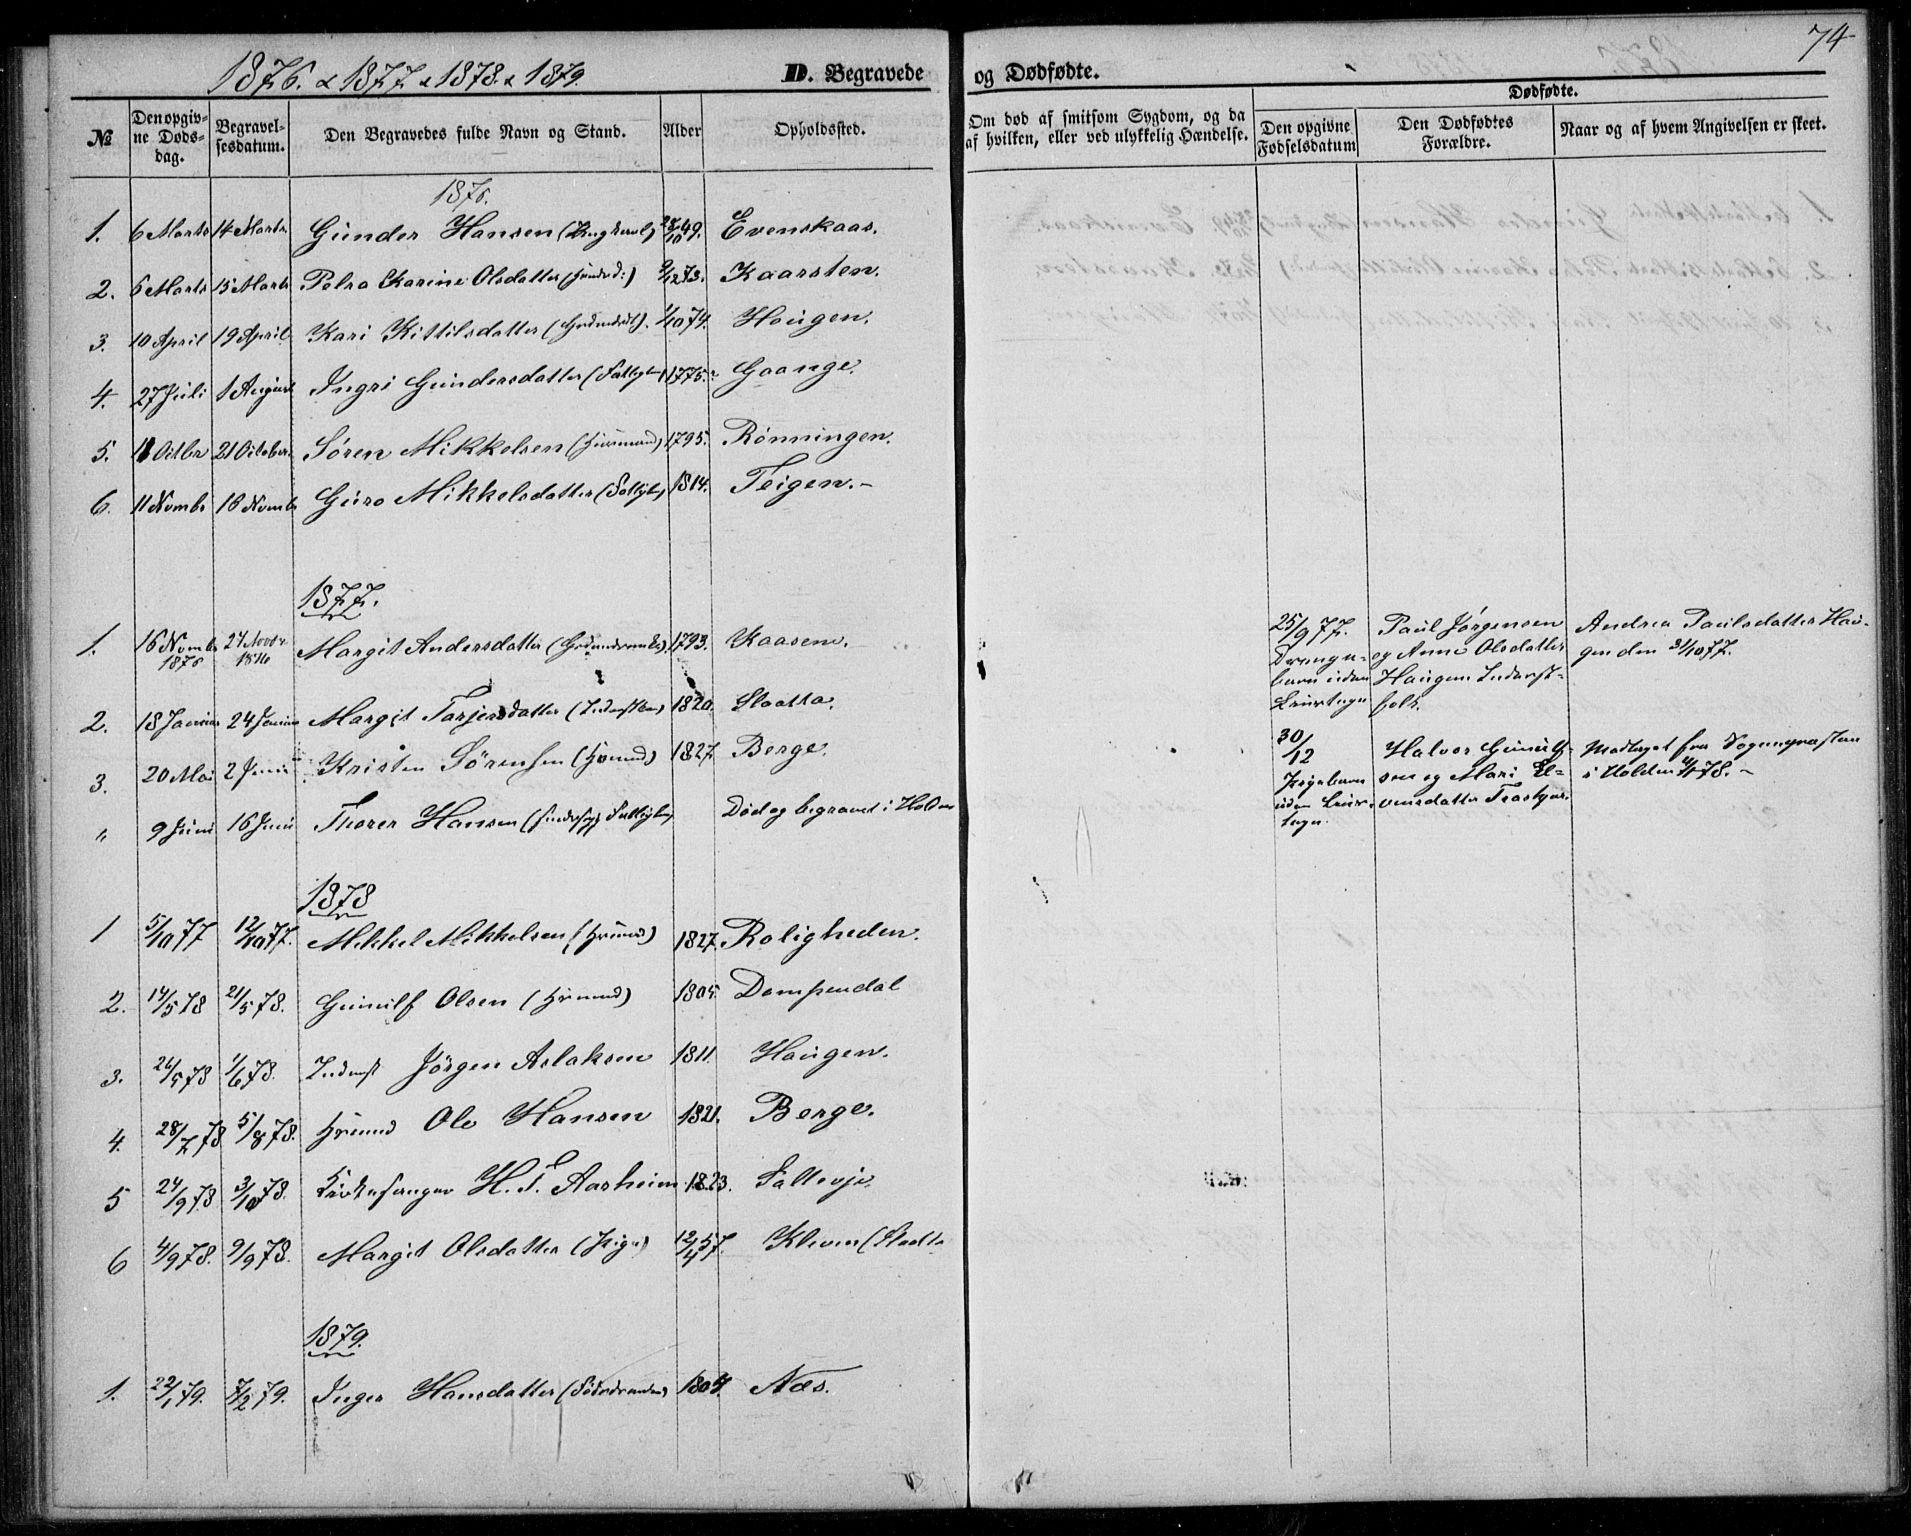 SAKO, Lunde kirkebøker, F/Fb/L0002: Ministerialbok nr. II 2, 1861-1881, s. 74